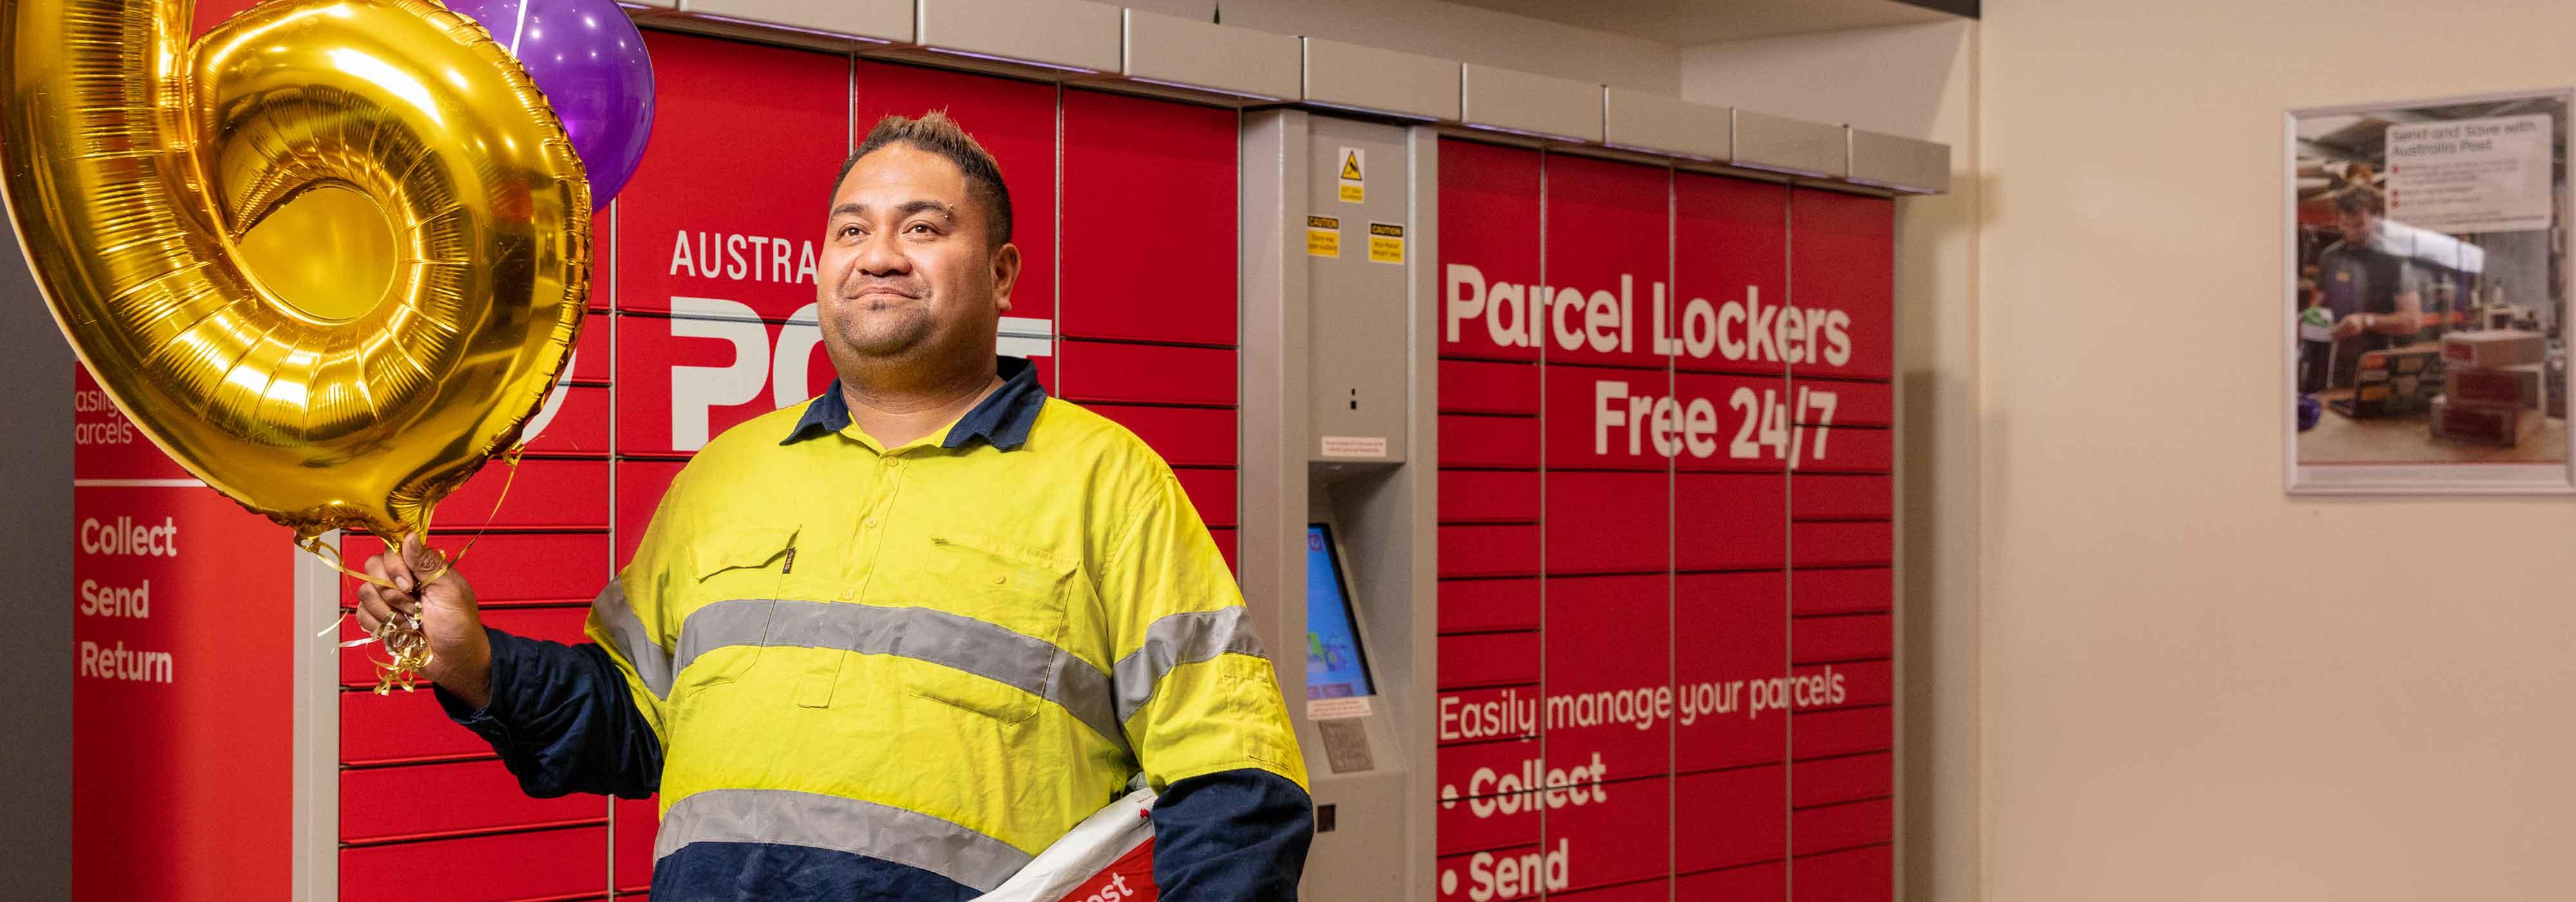 Use a 24/7 Parcel Locker - Australia Post